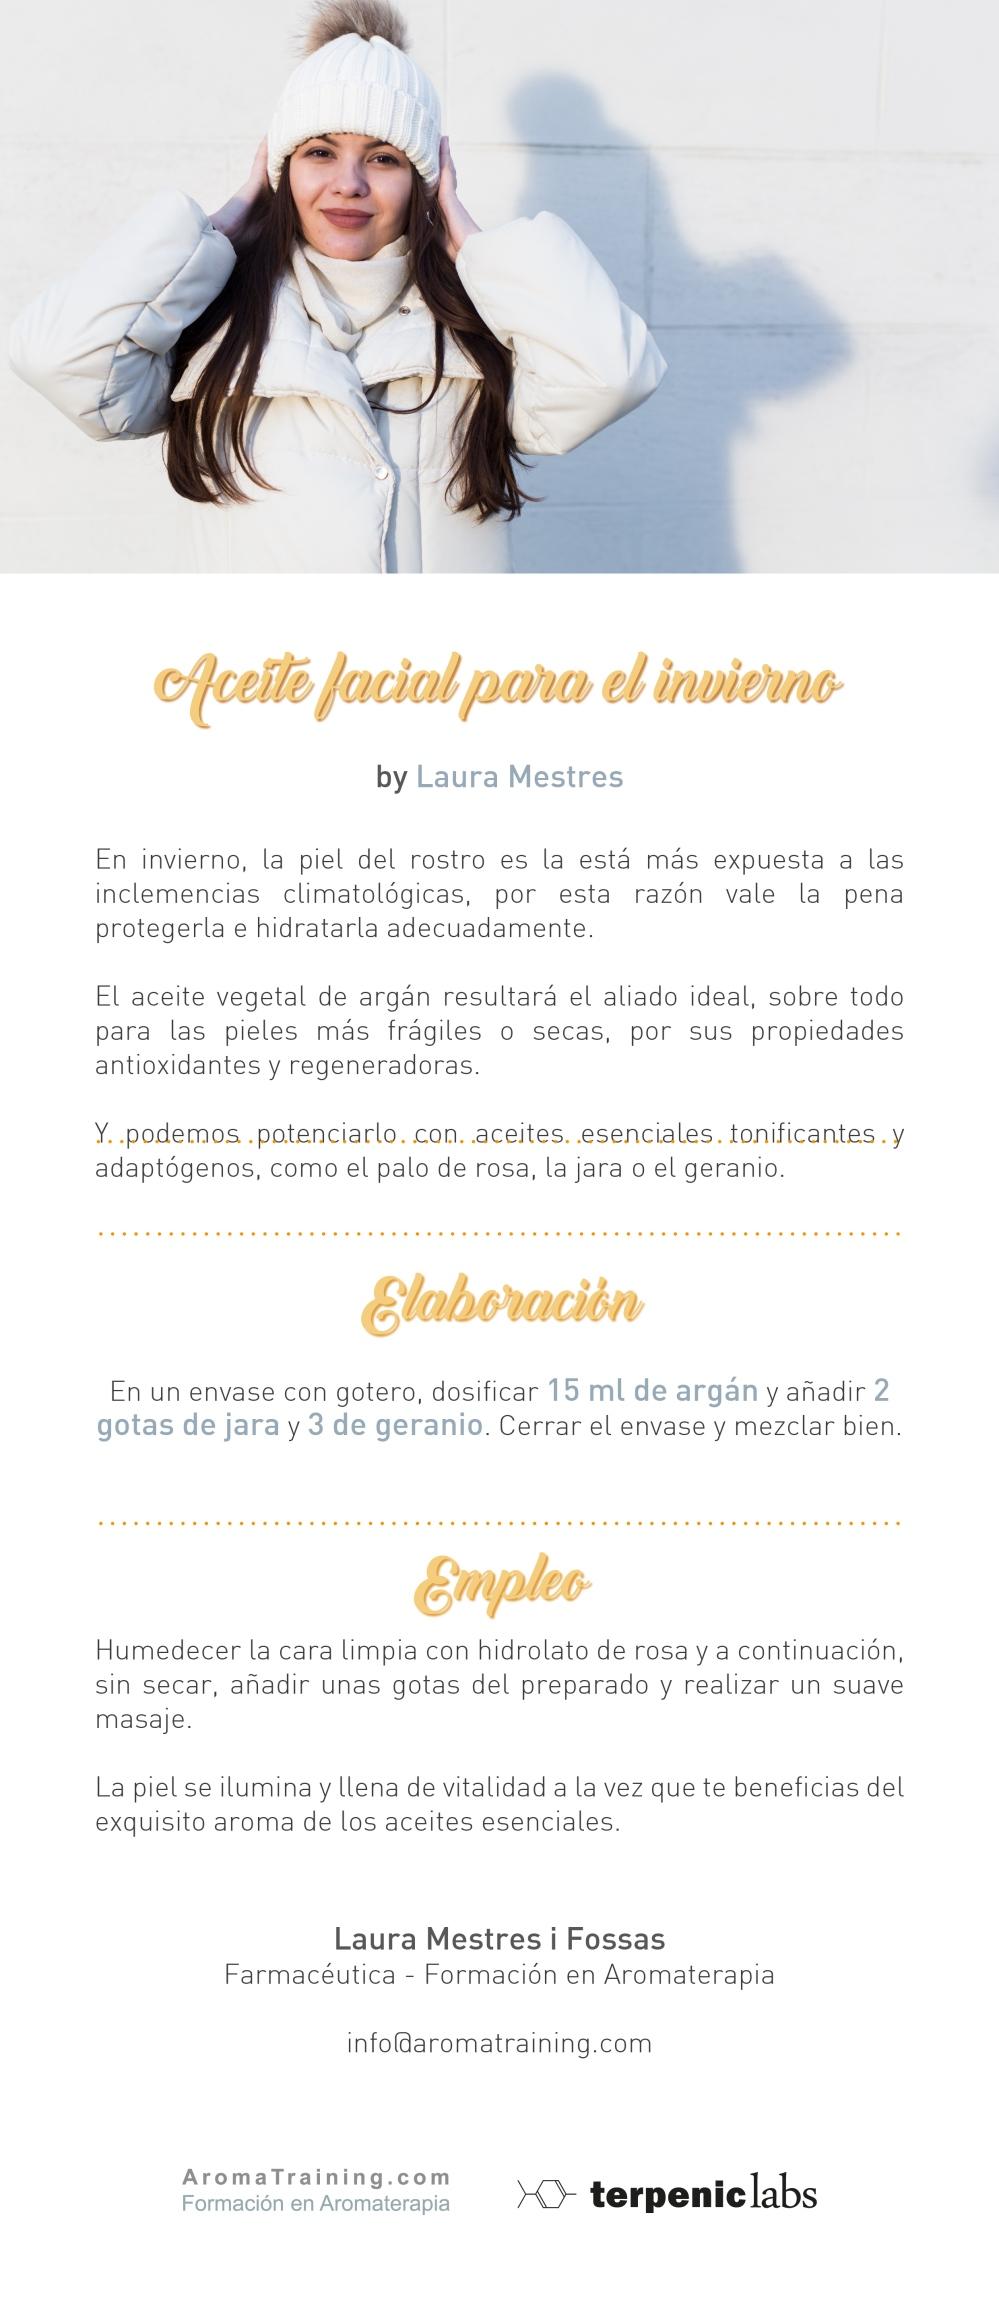 lauramestresfossas-aromatraining-02